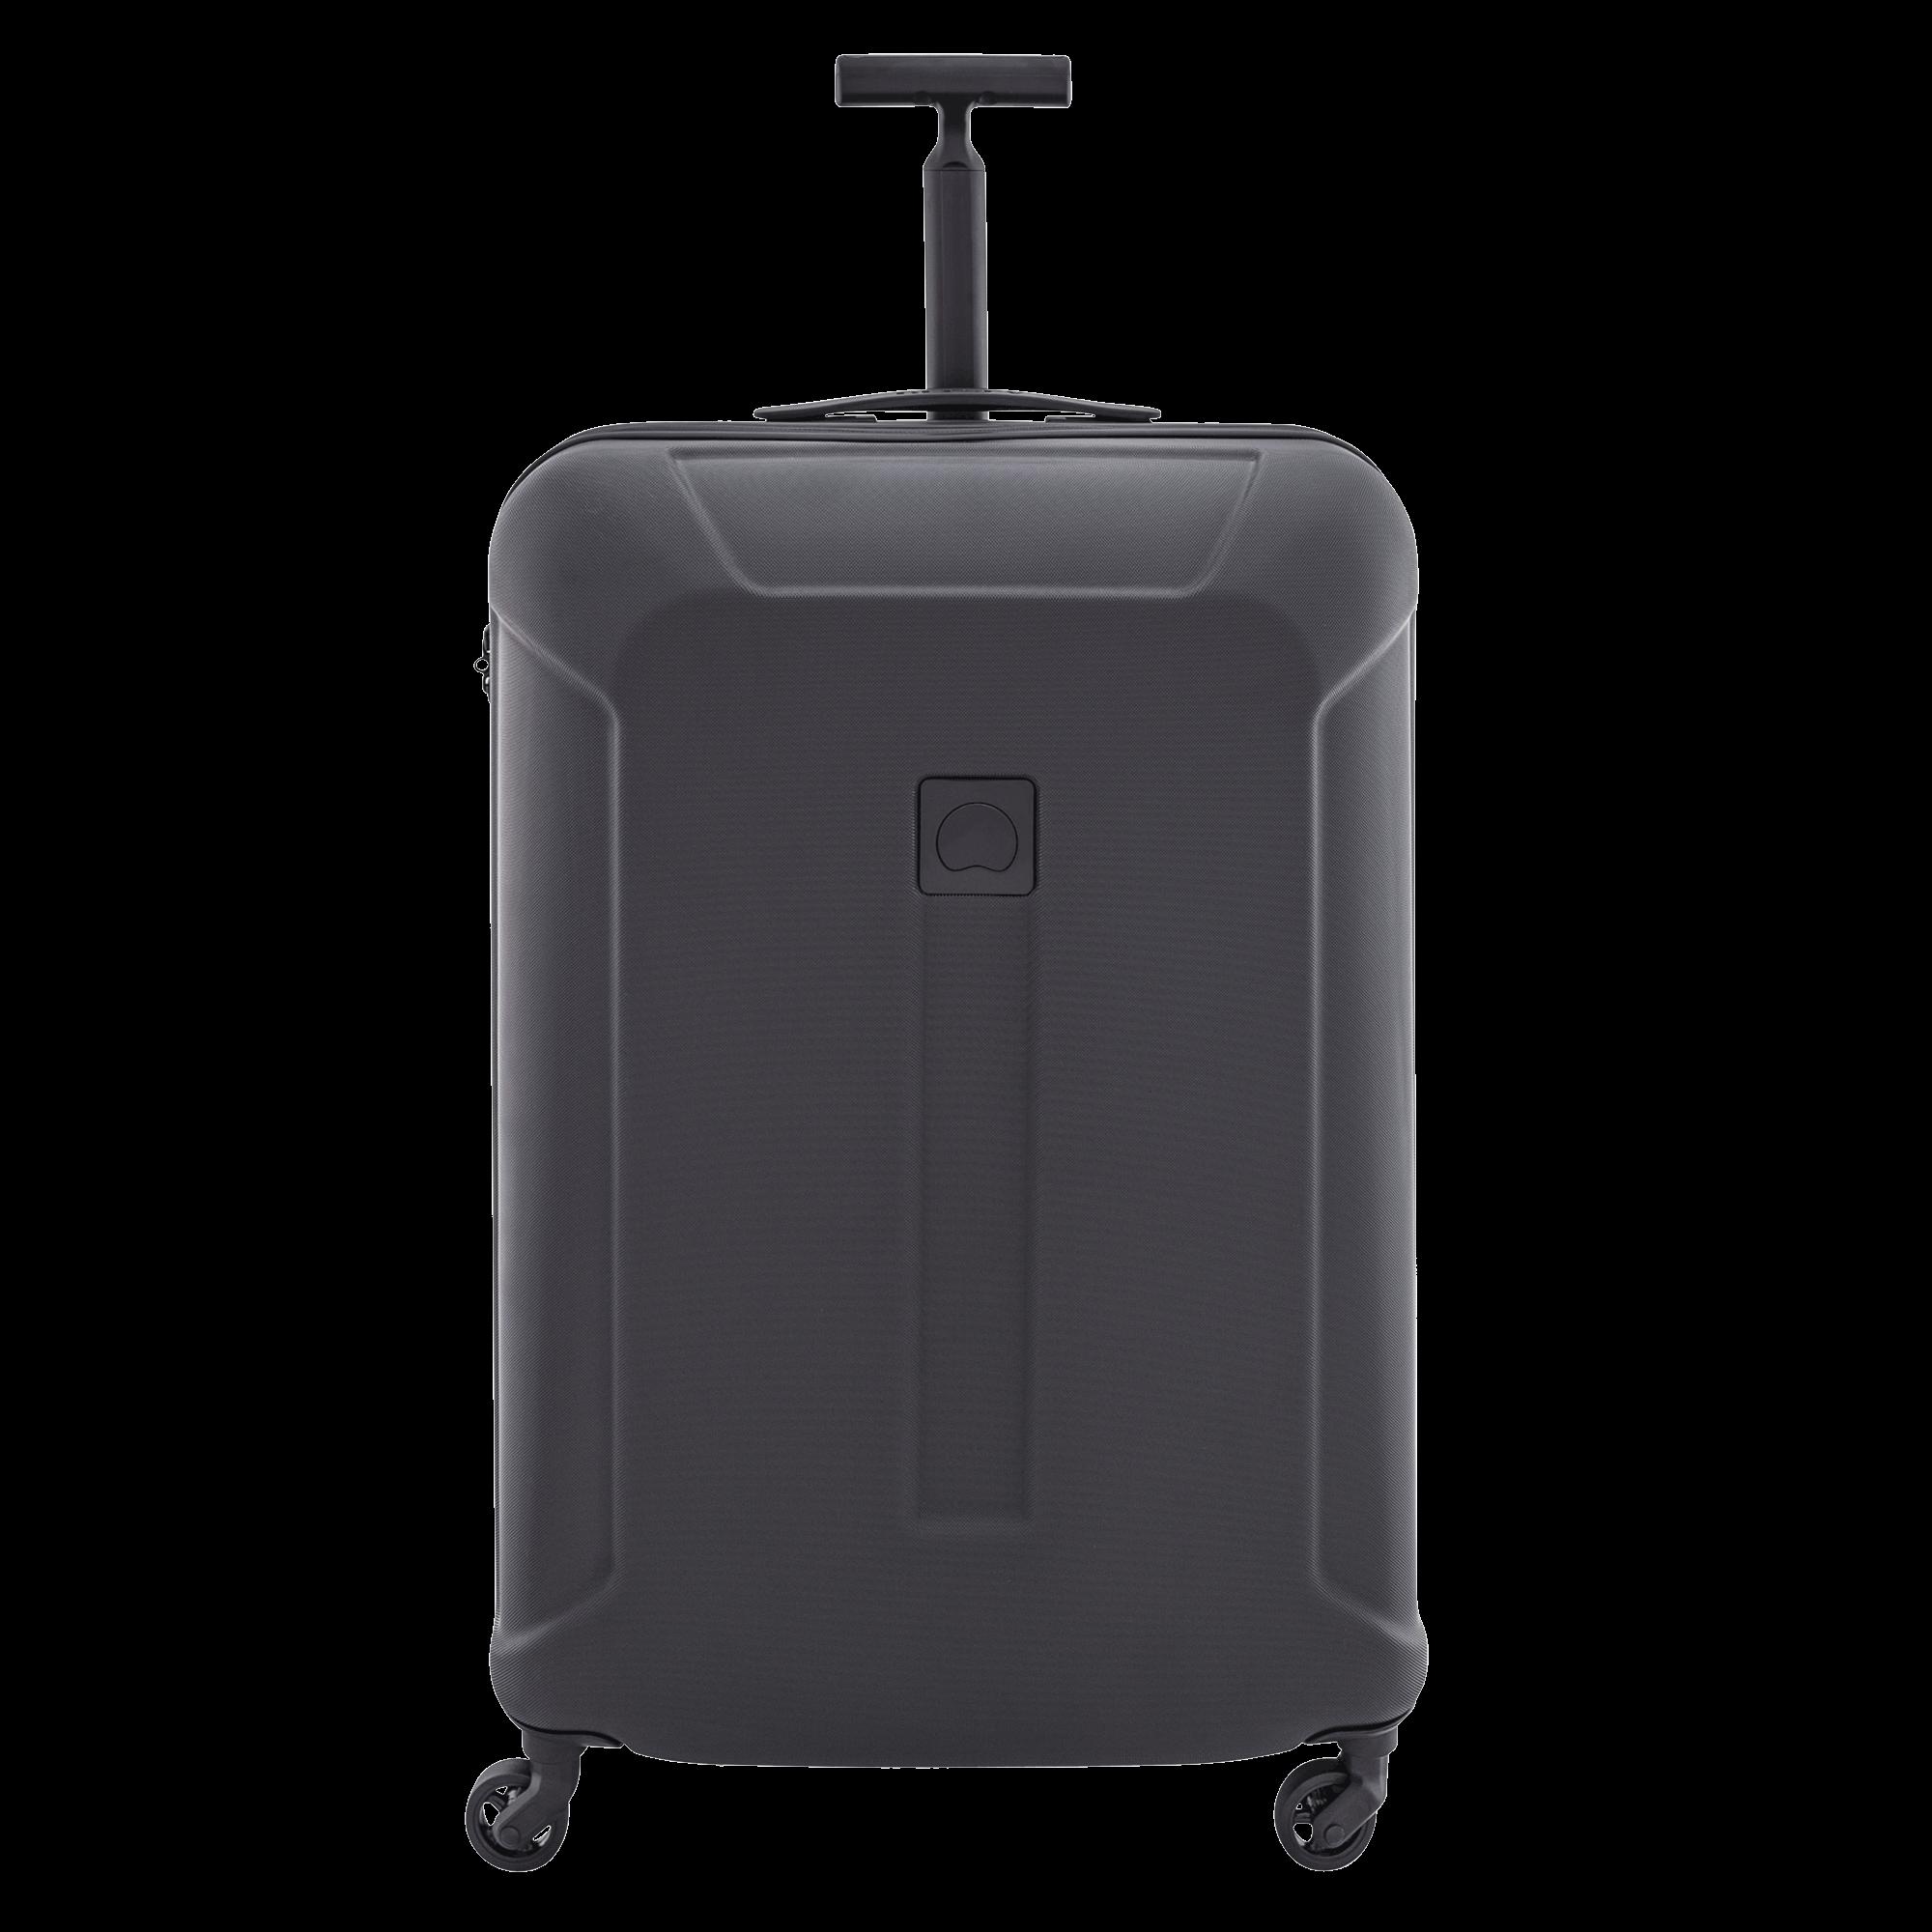 Black Suitcase PNG Image.